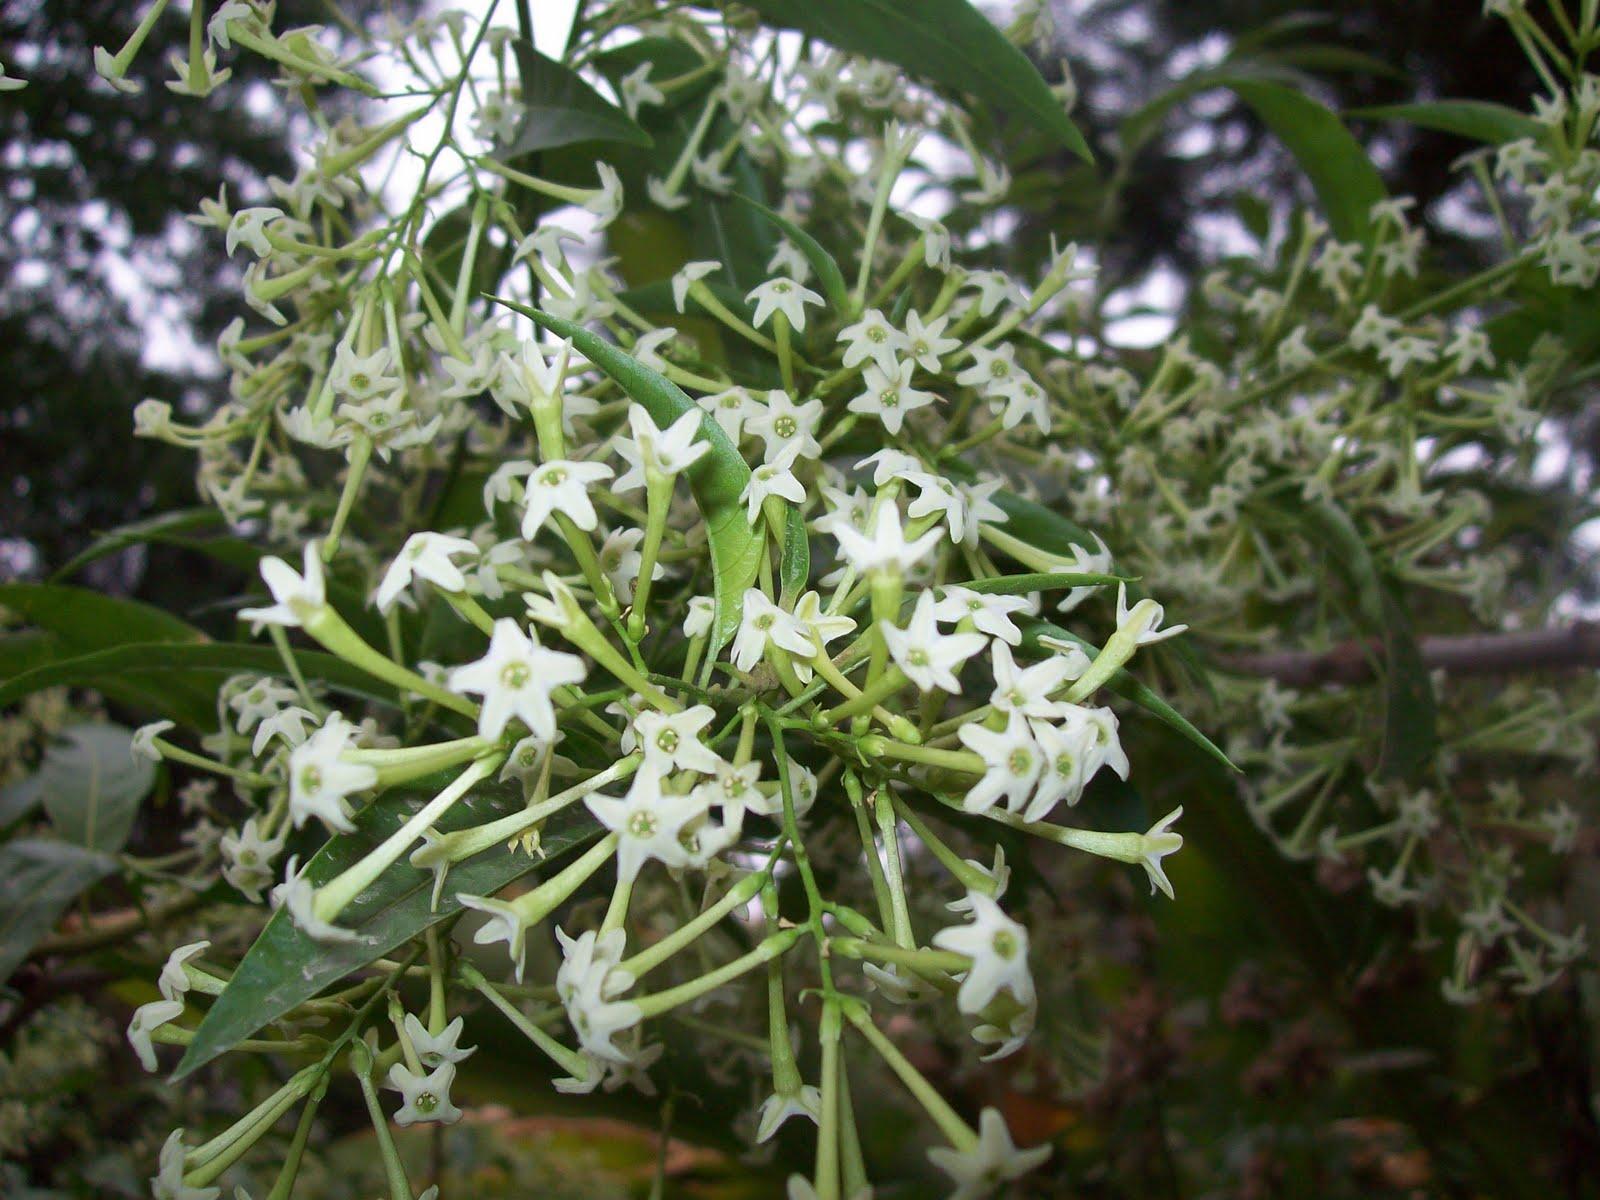 Gardentropics jasmine and pseudo jasmine jasmine and pseudo jasmine izmirmasajfo Image collections